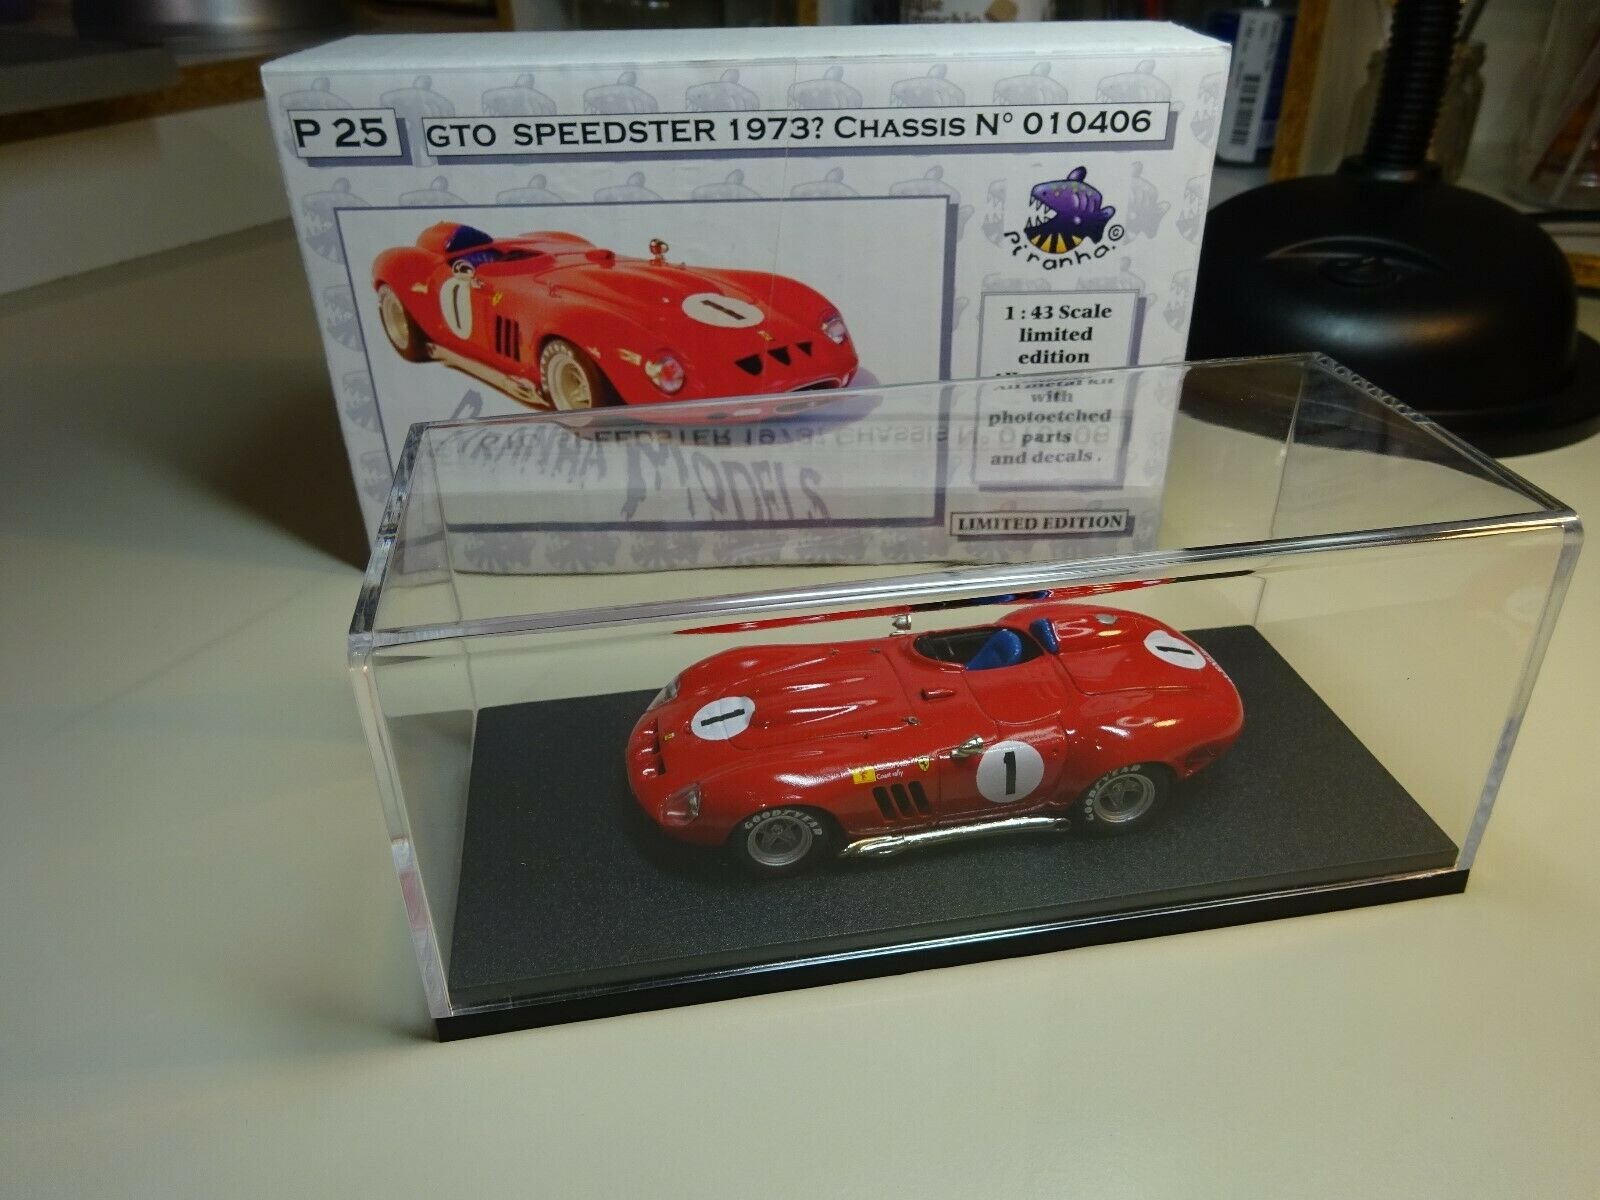 Ferrari 250 GTO Speedster 1973 1 43 Piranha Kit P25 built raro n. AMR Phoenix MG